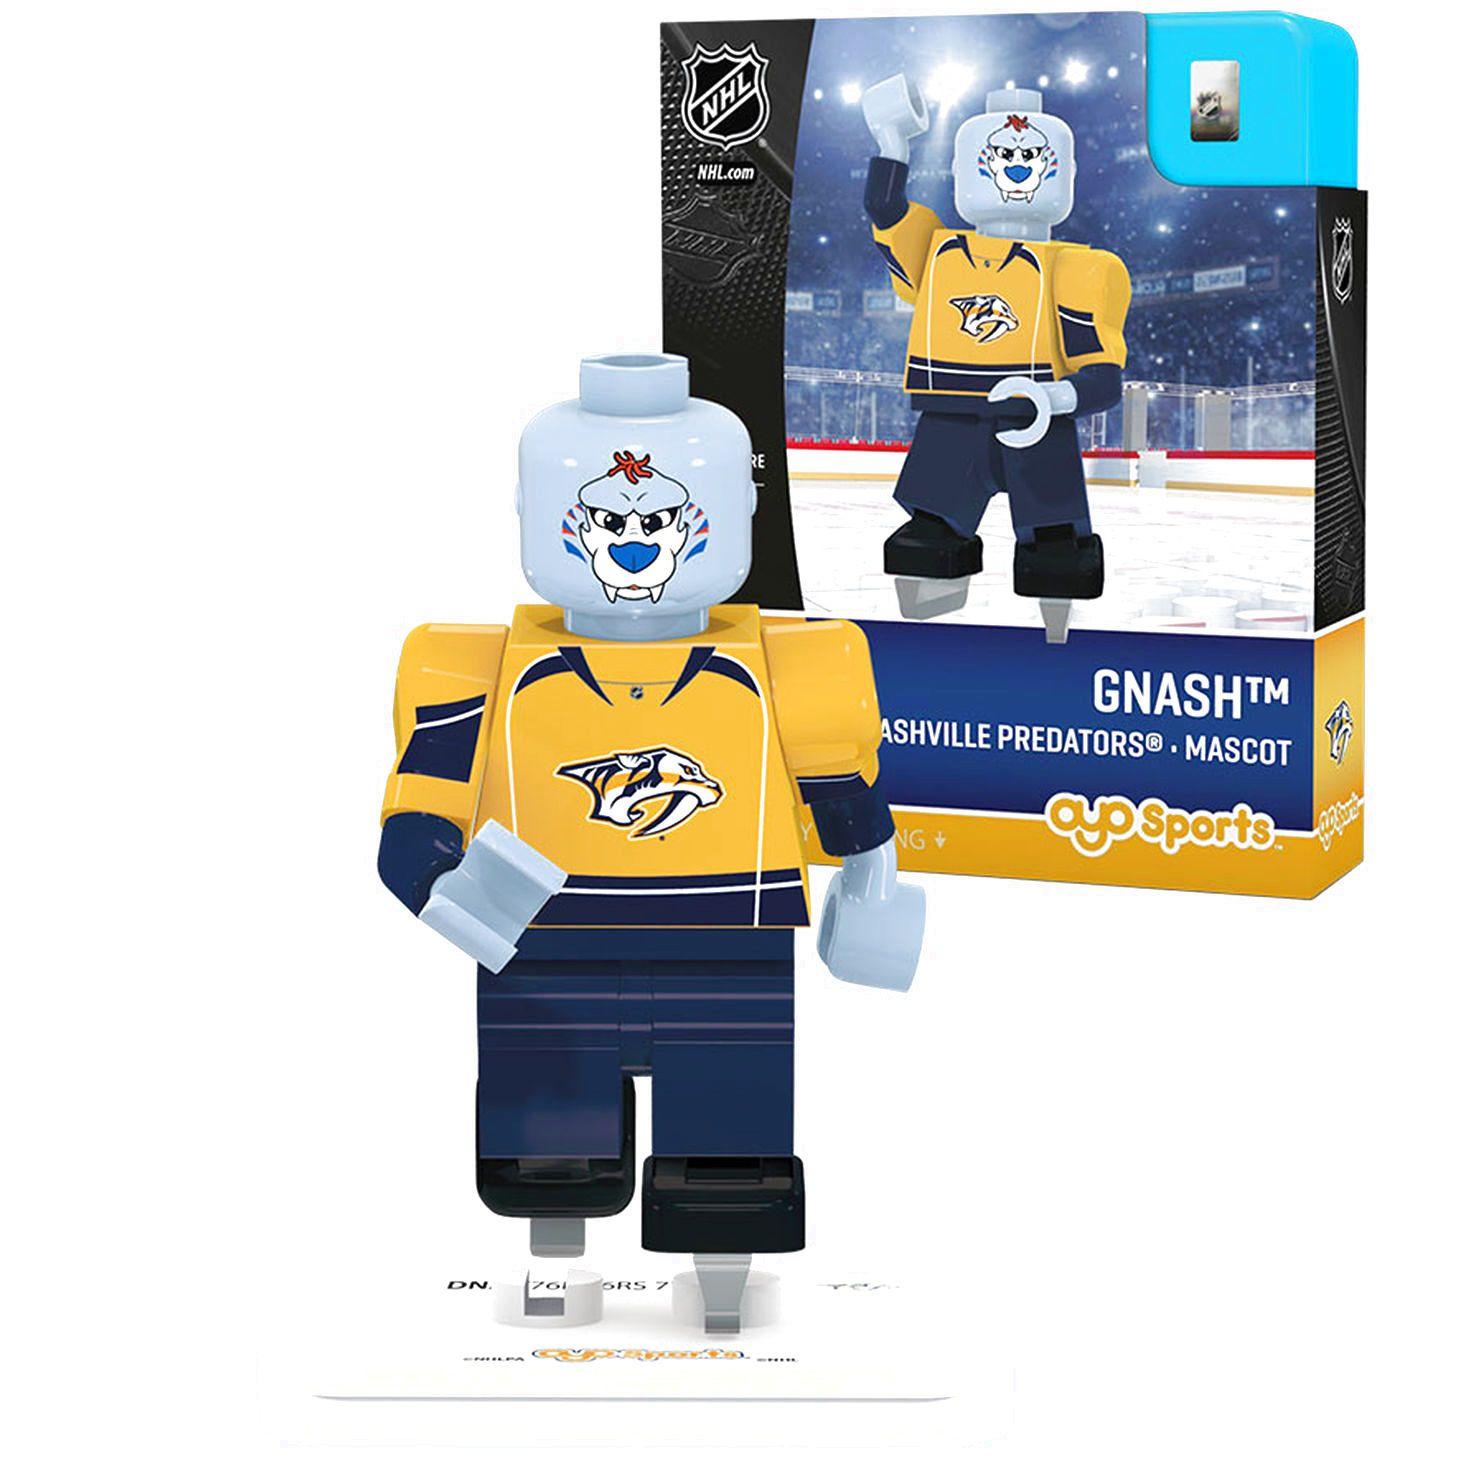 Gnash nashville predators oyo sports generation 3 mascot